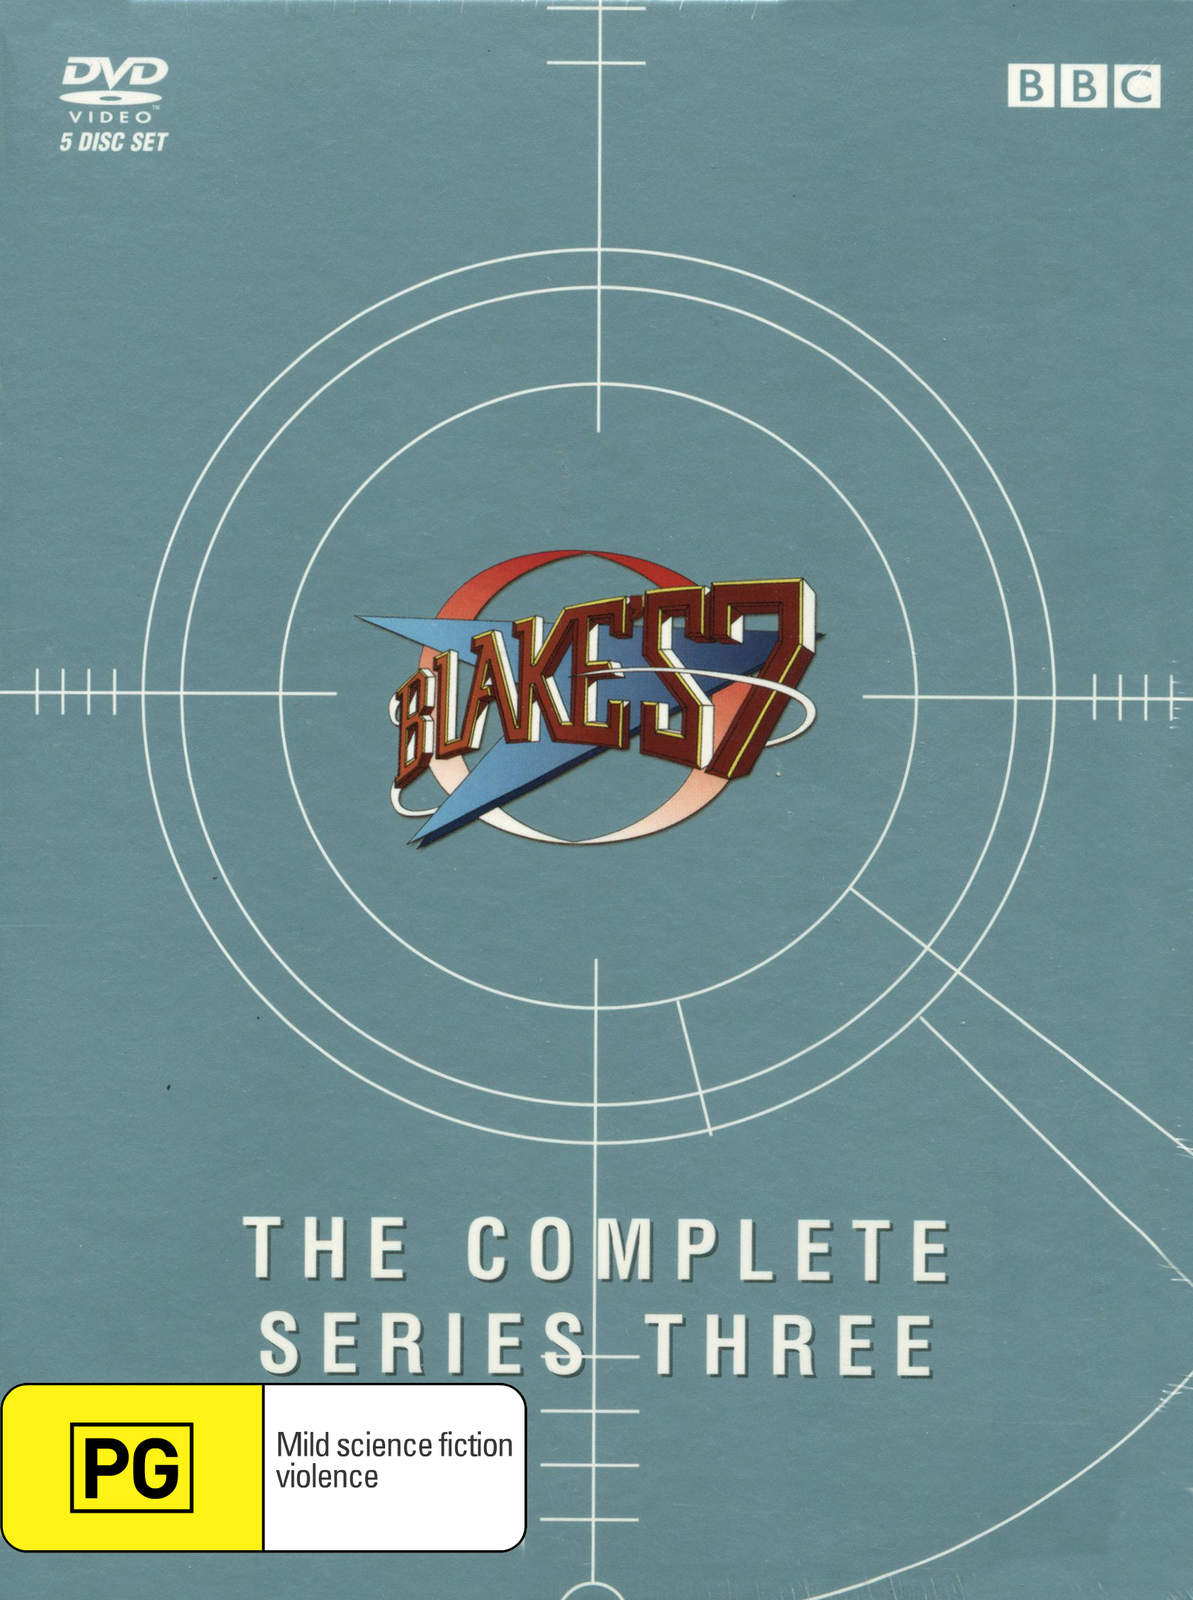 Blake's 7 - Complete Series 3 on DVD image